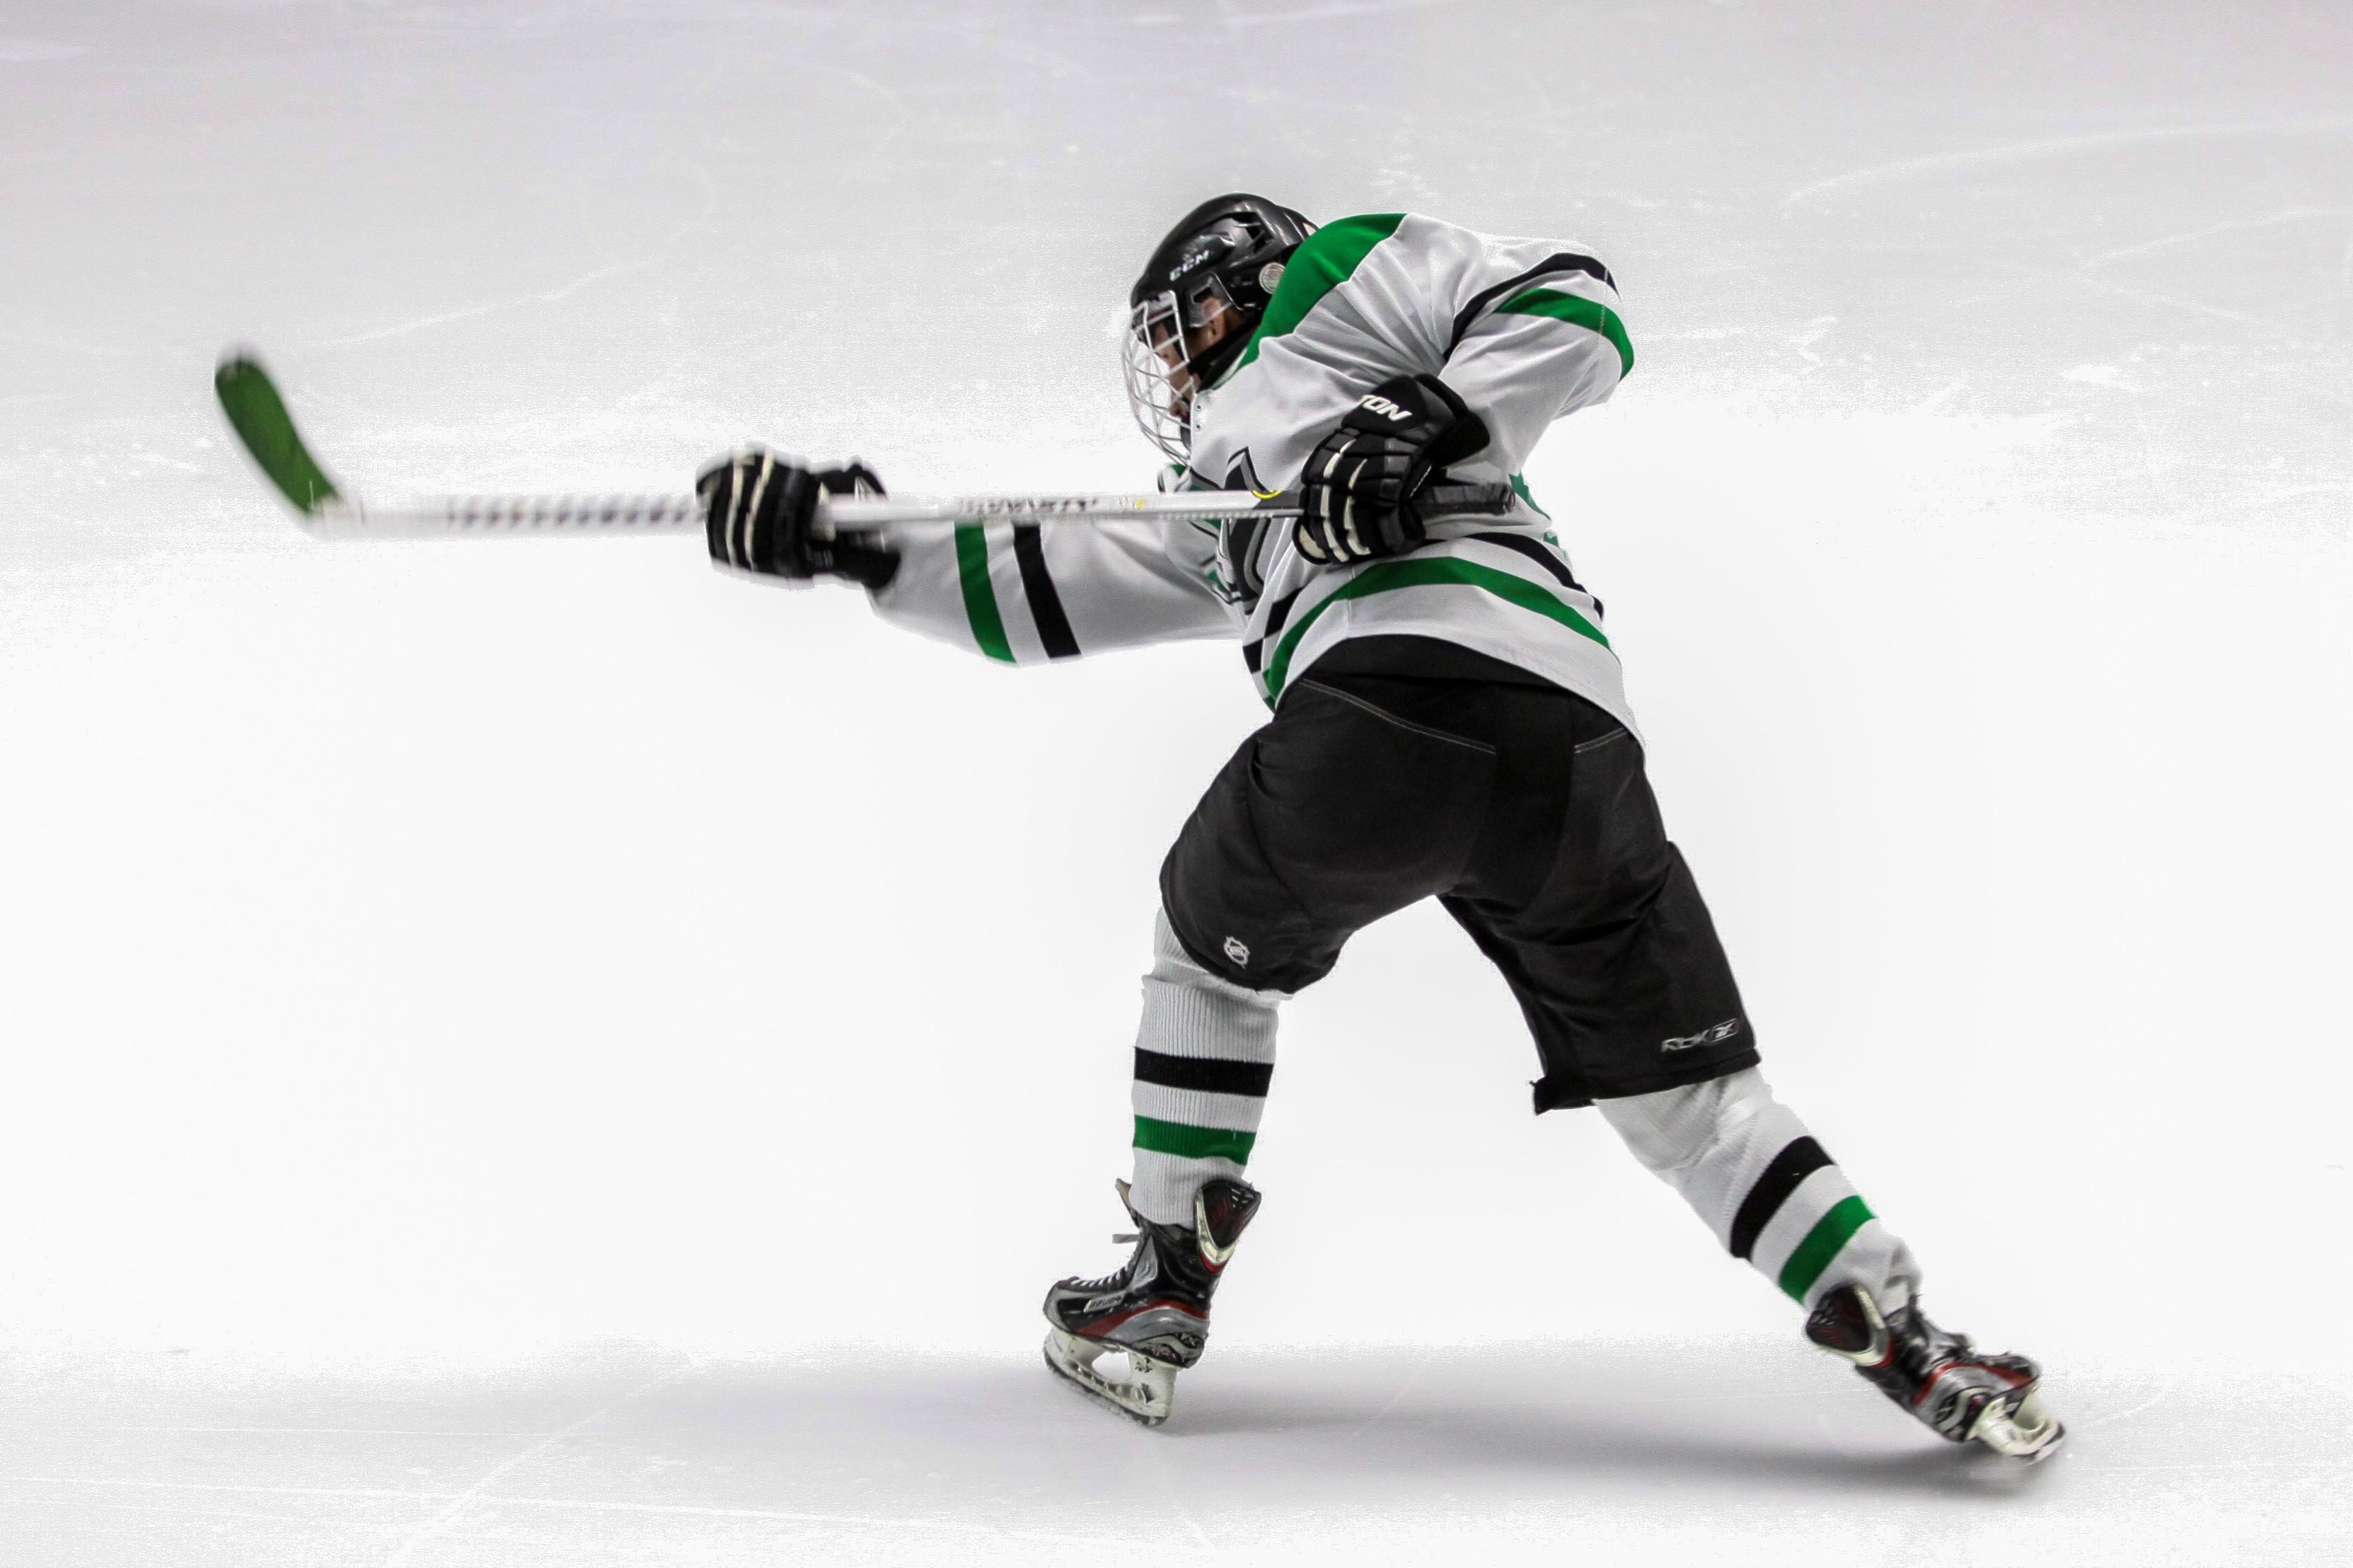 STREĽBA & ZRUČNOSTI s hokejkou